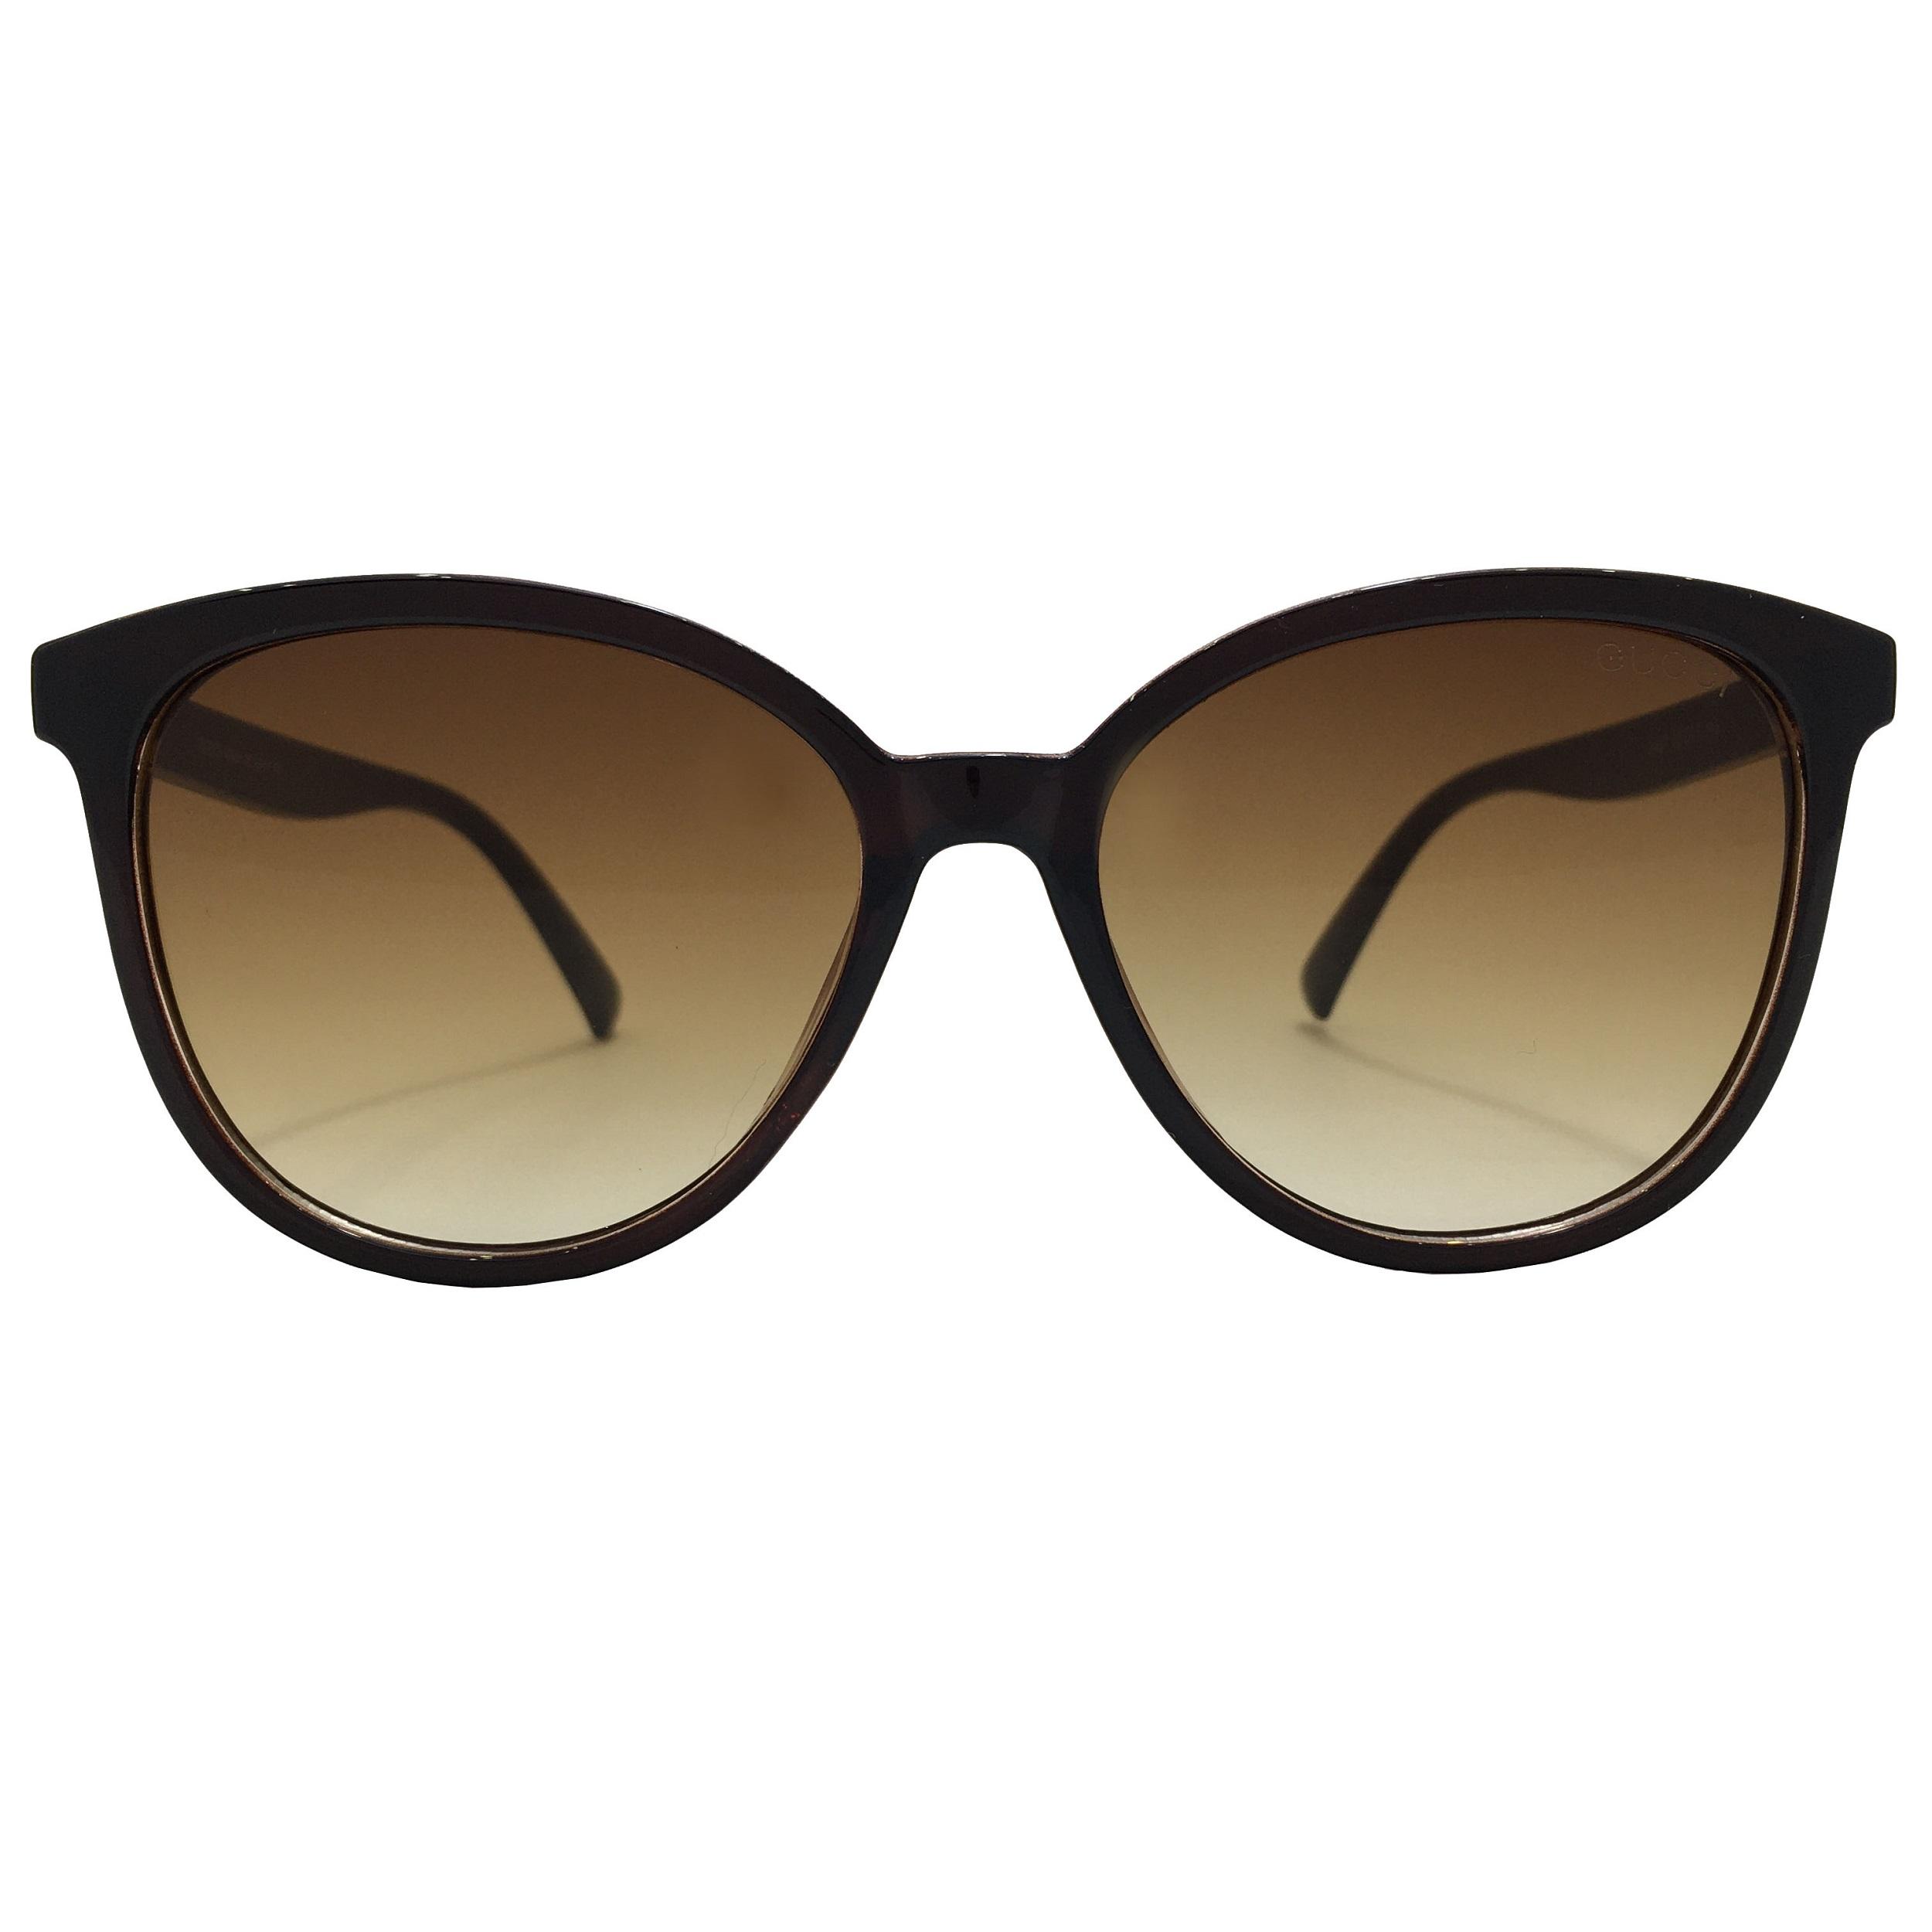 عینک آفتابی  مدل 8407                     غیر اصل